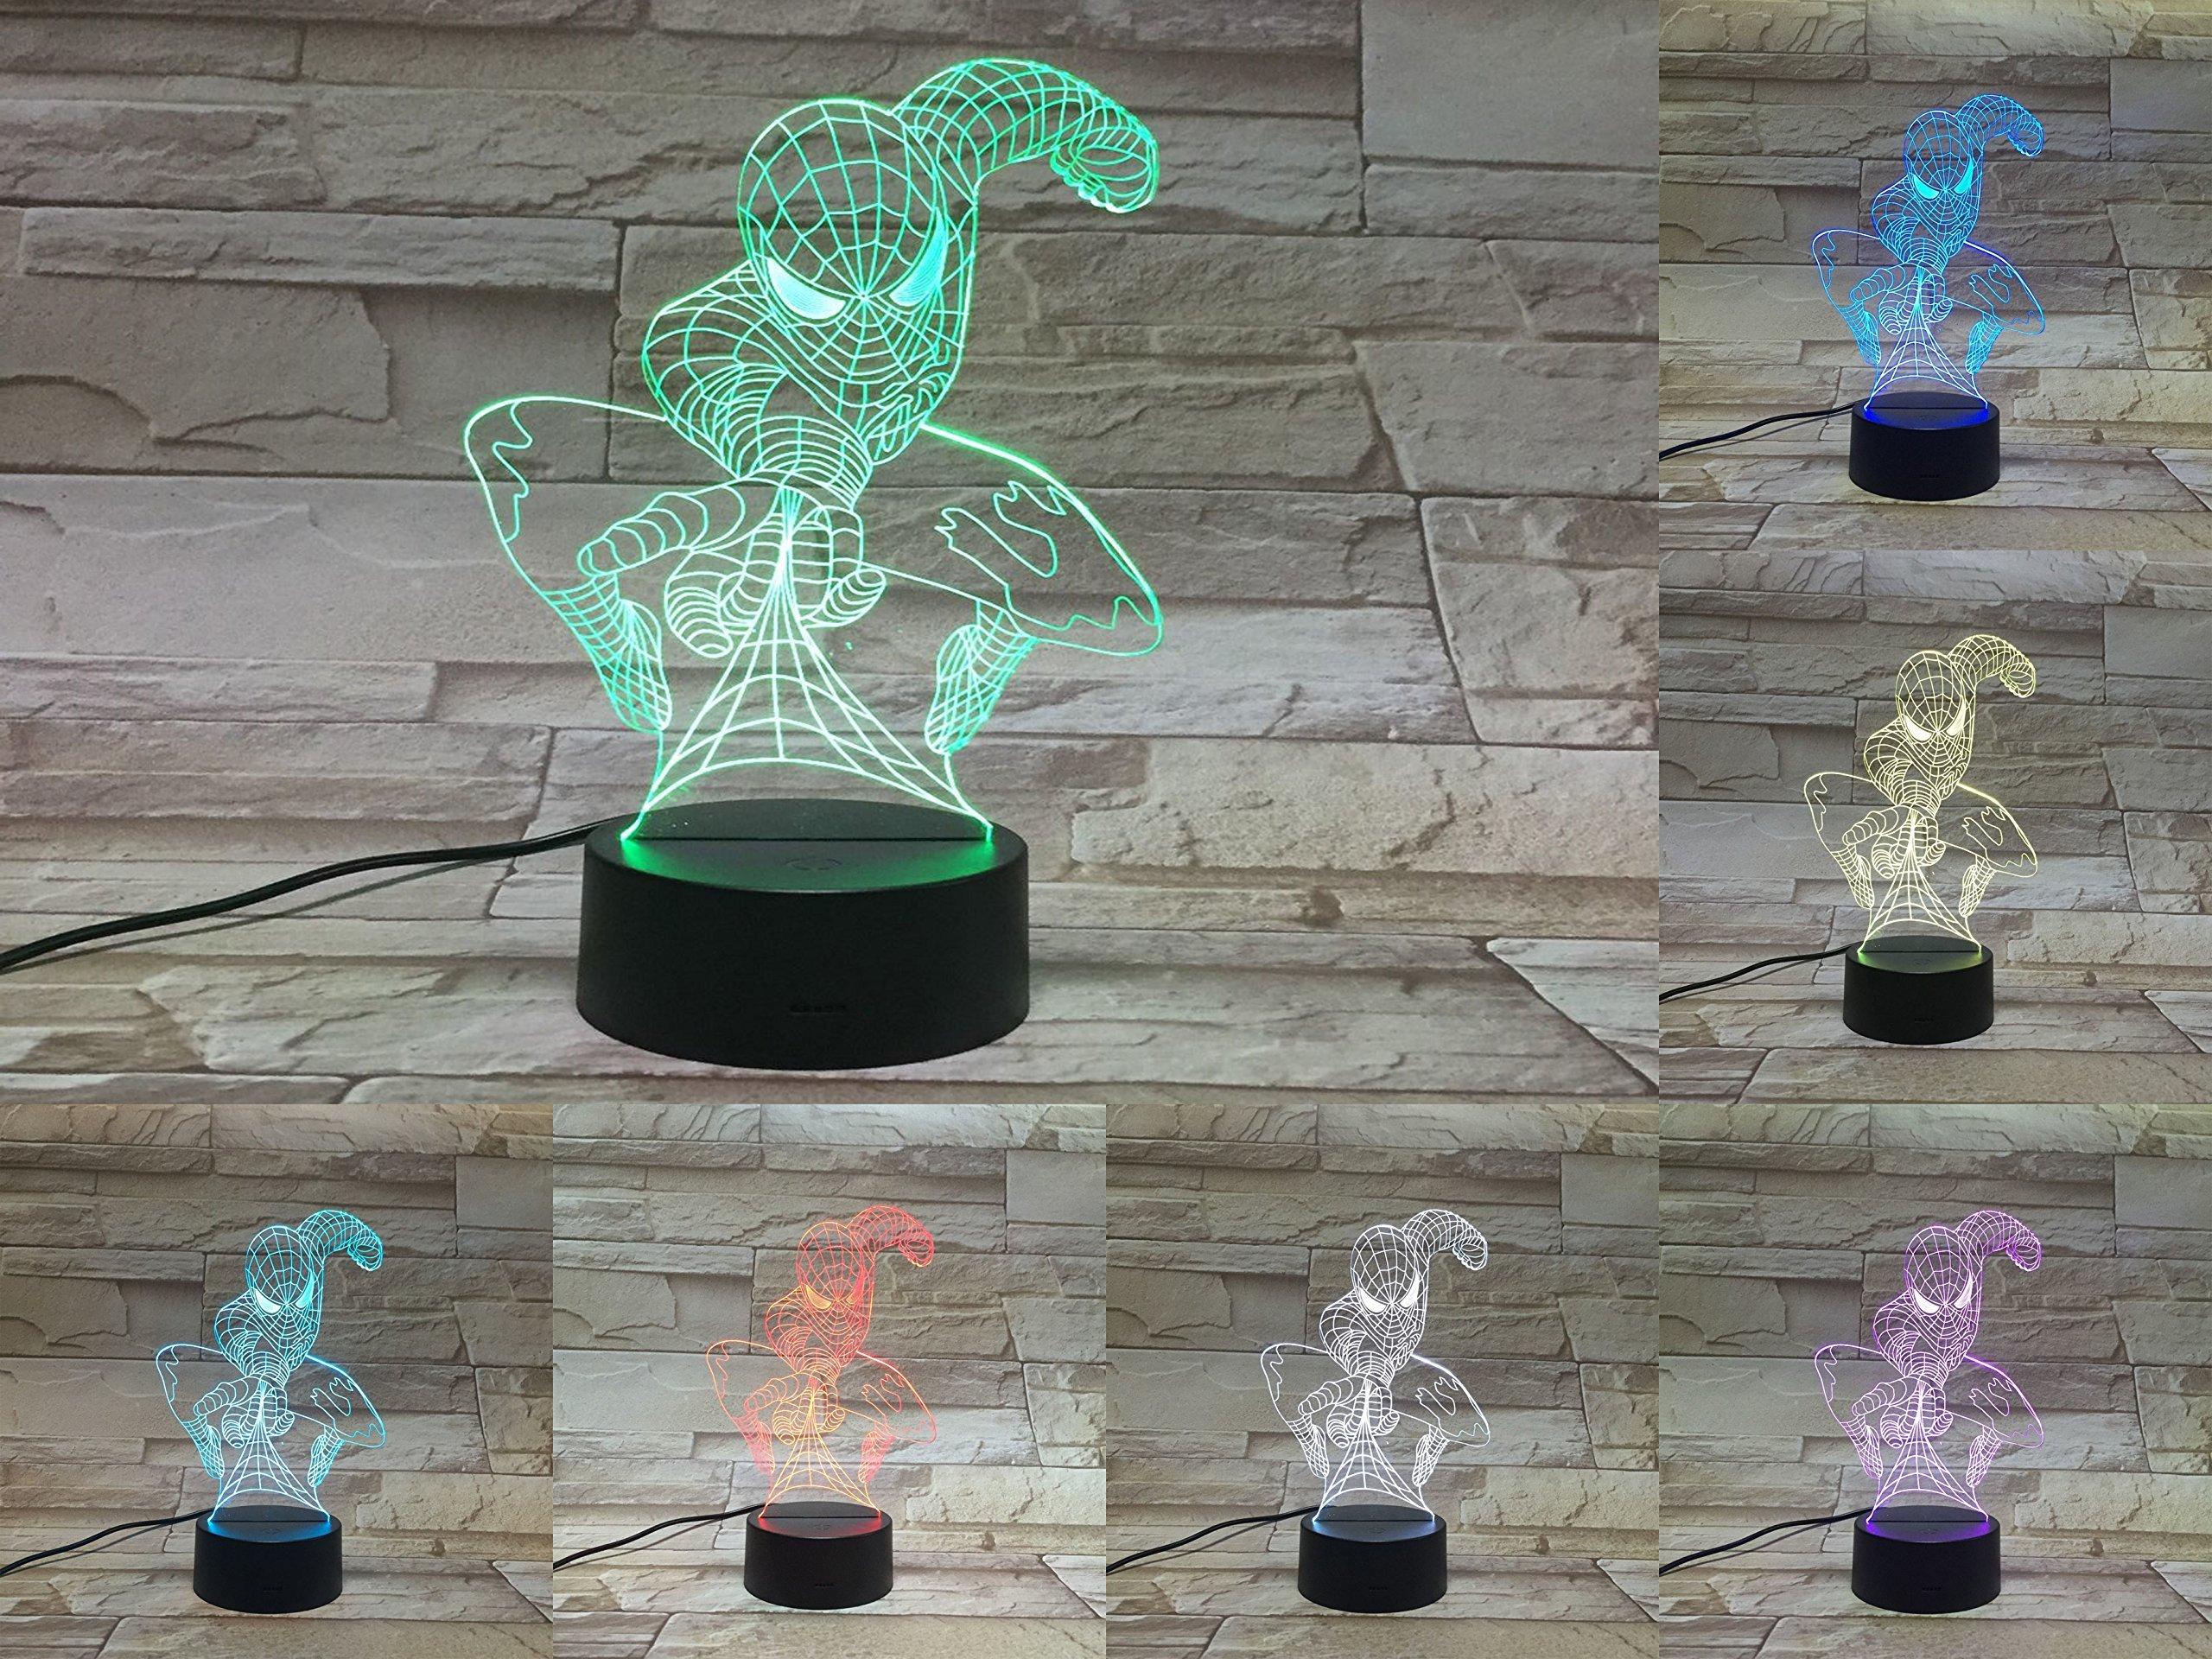 LE3D 3D Optical Illusion Desk Lamp/3D Optical Illusion Night Light, 7 Color LED 3D Lamp, Marvel Comics 3D LED For Kids and Adults, Spider-Man Light Up